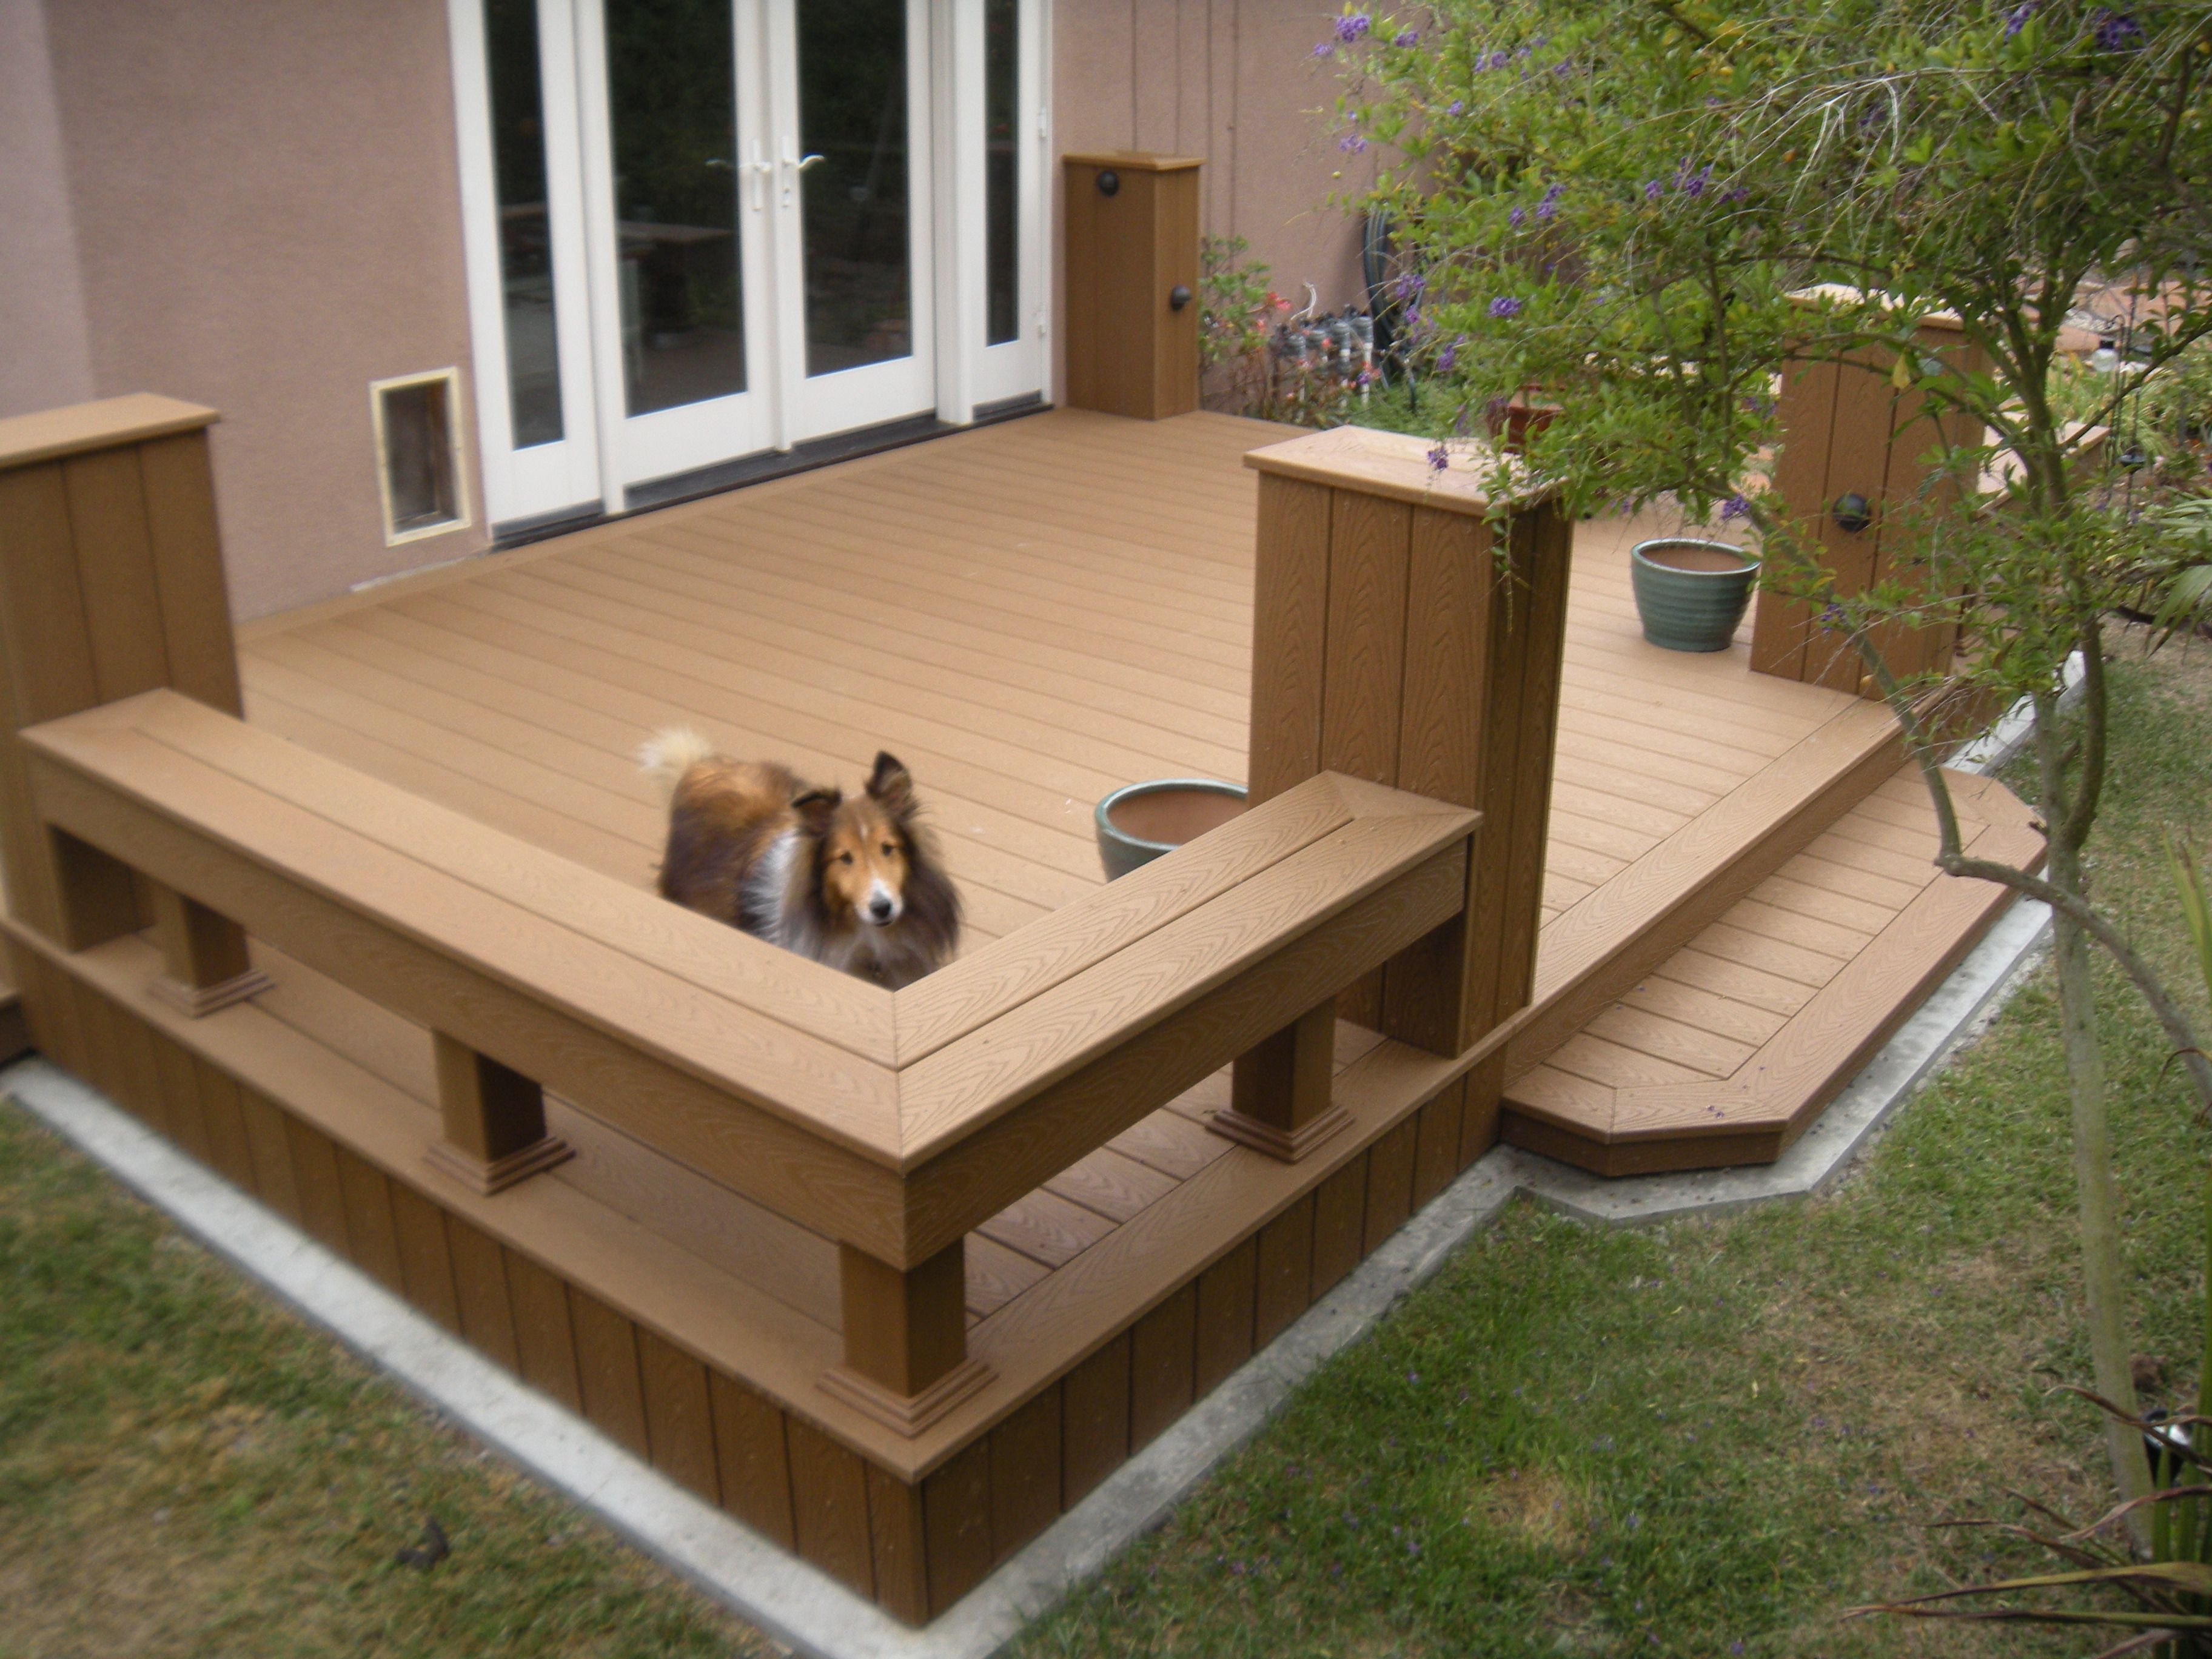 Trex Deck Built Murphy Dog Safely Exit